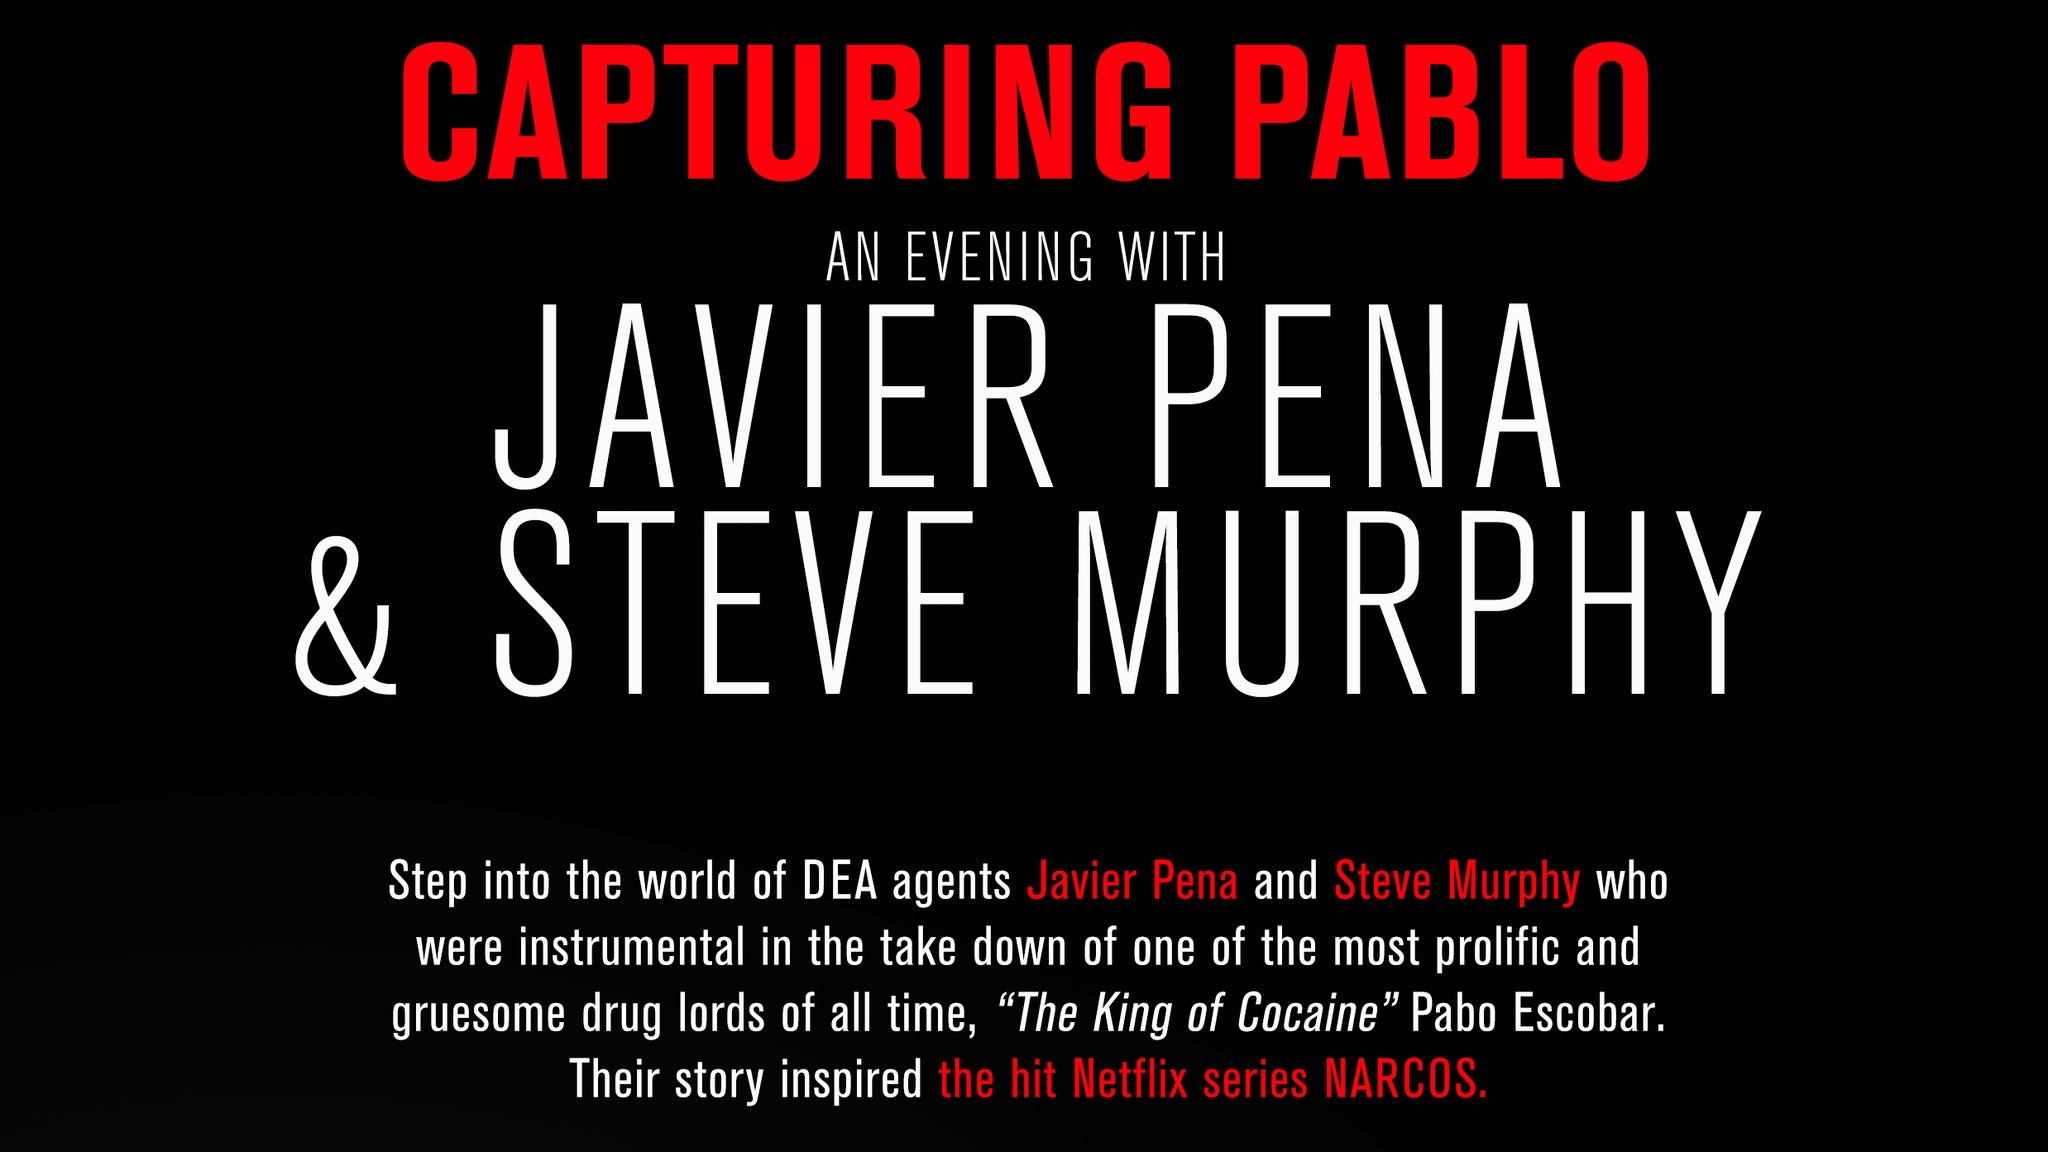 Capturing Pablo at Paramount Theatre-Colorado